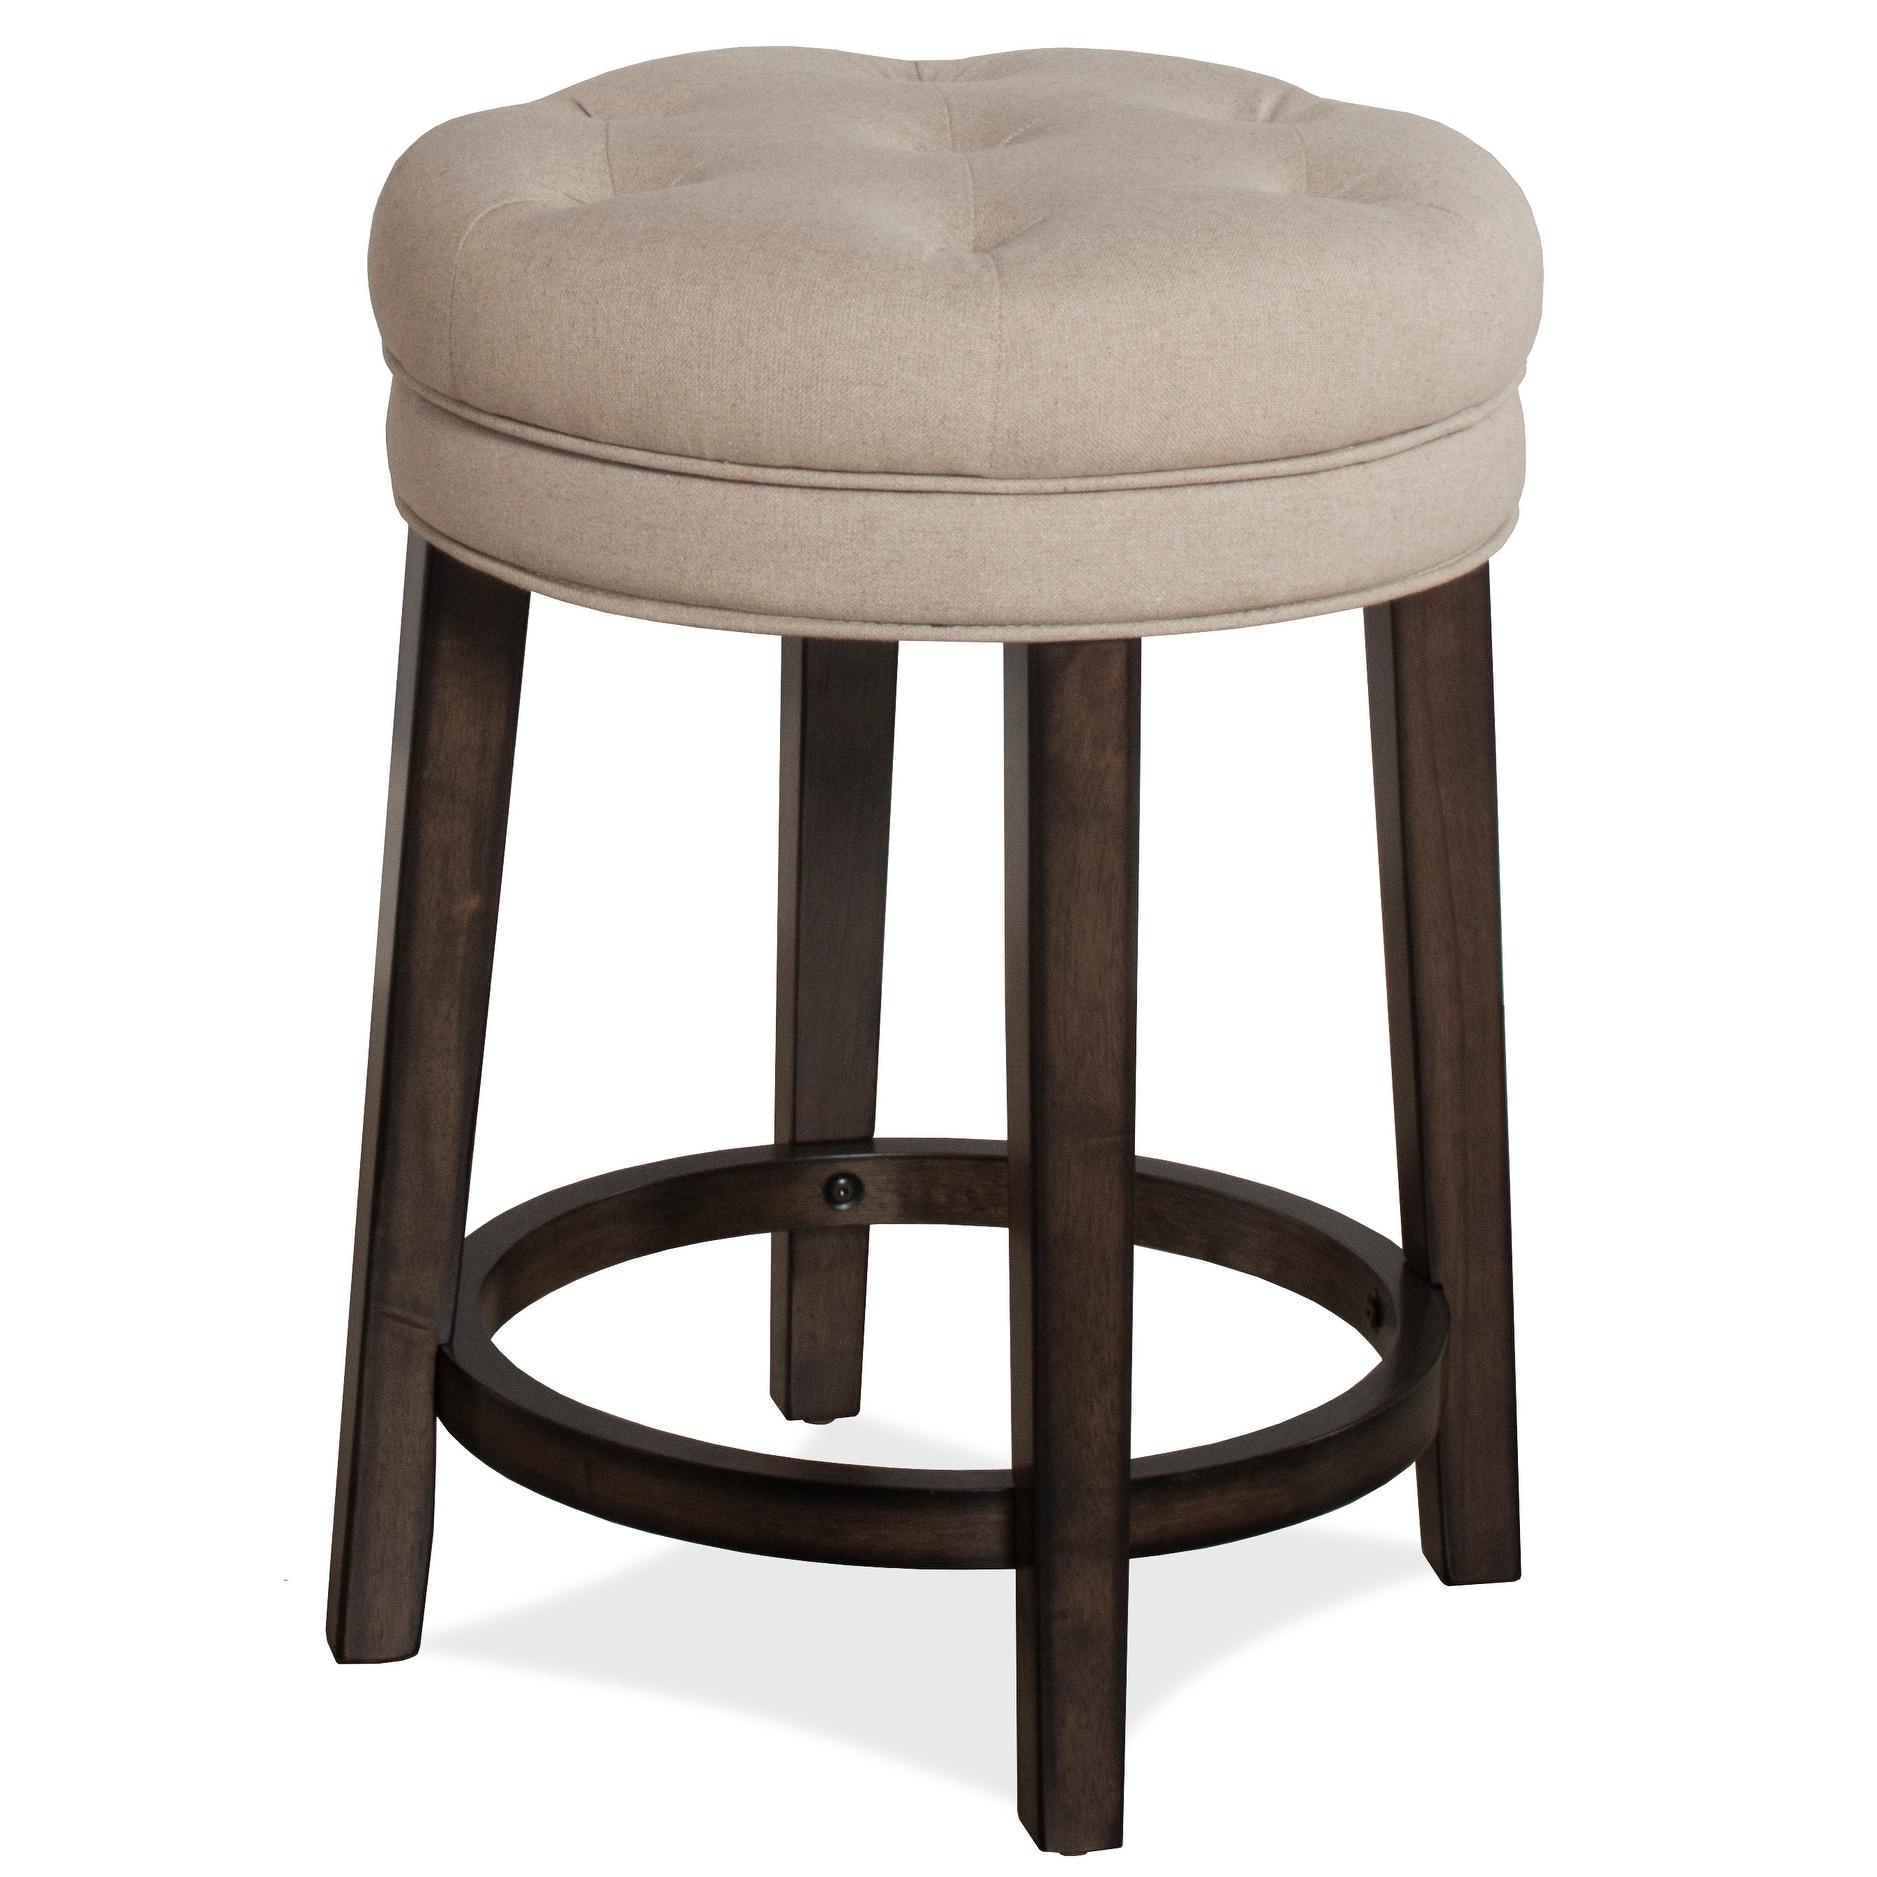 Hilale Furniture Krauss